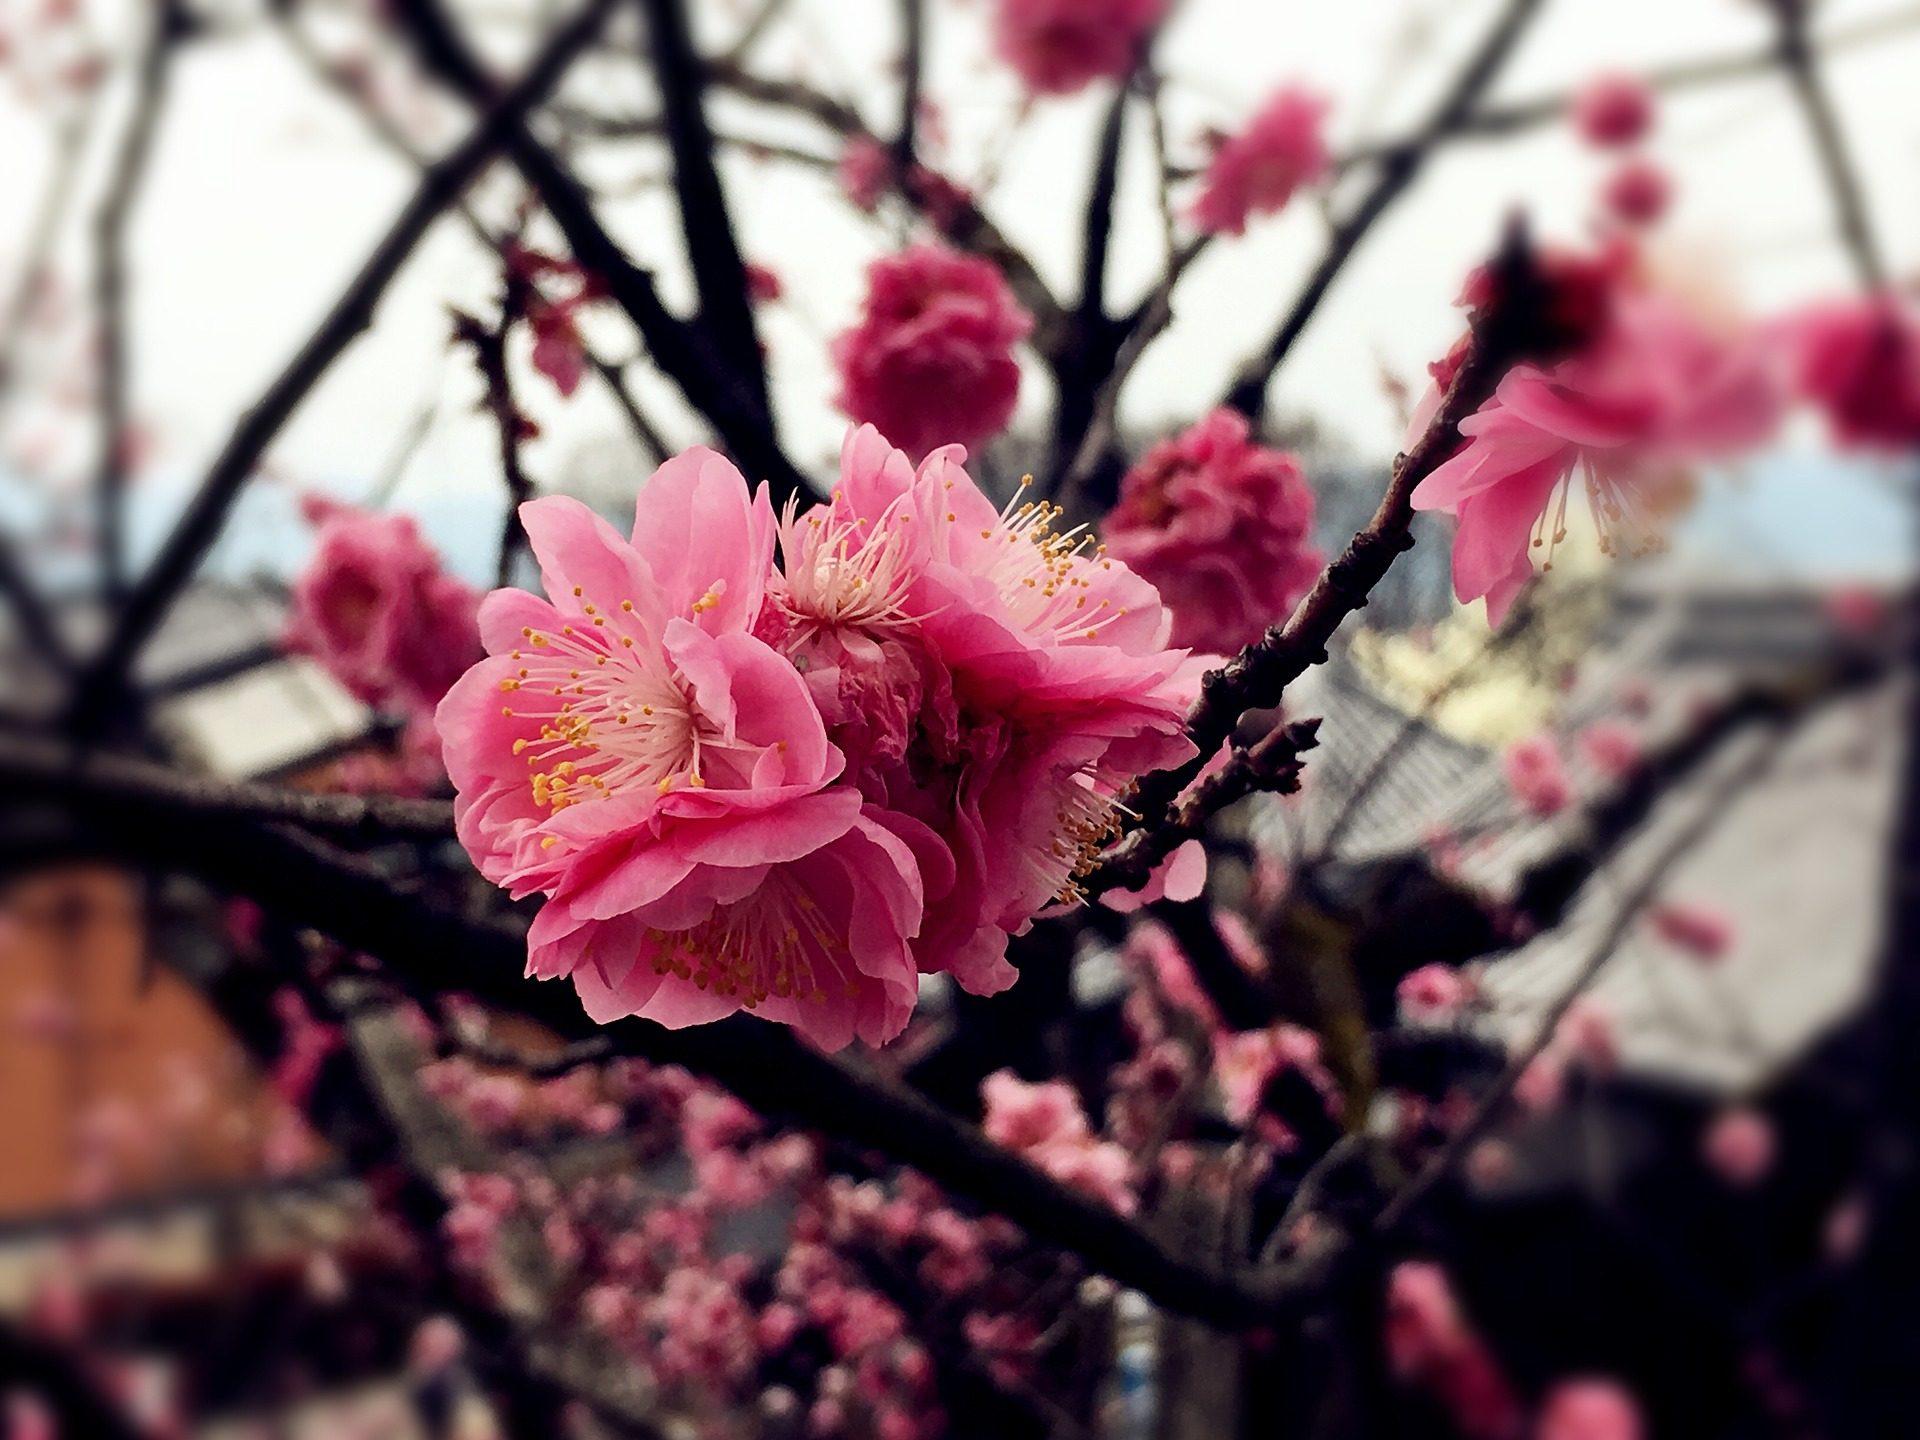 árbol Japonés Sakura Flor De Cerezo Aislada Fotografía De